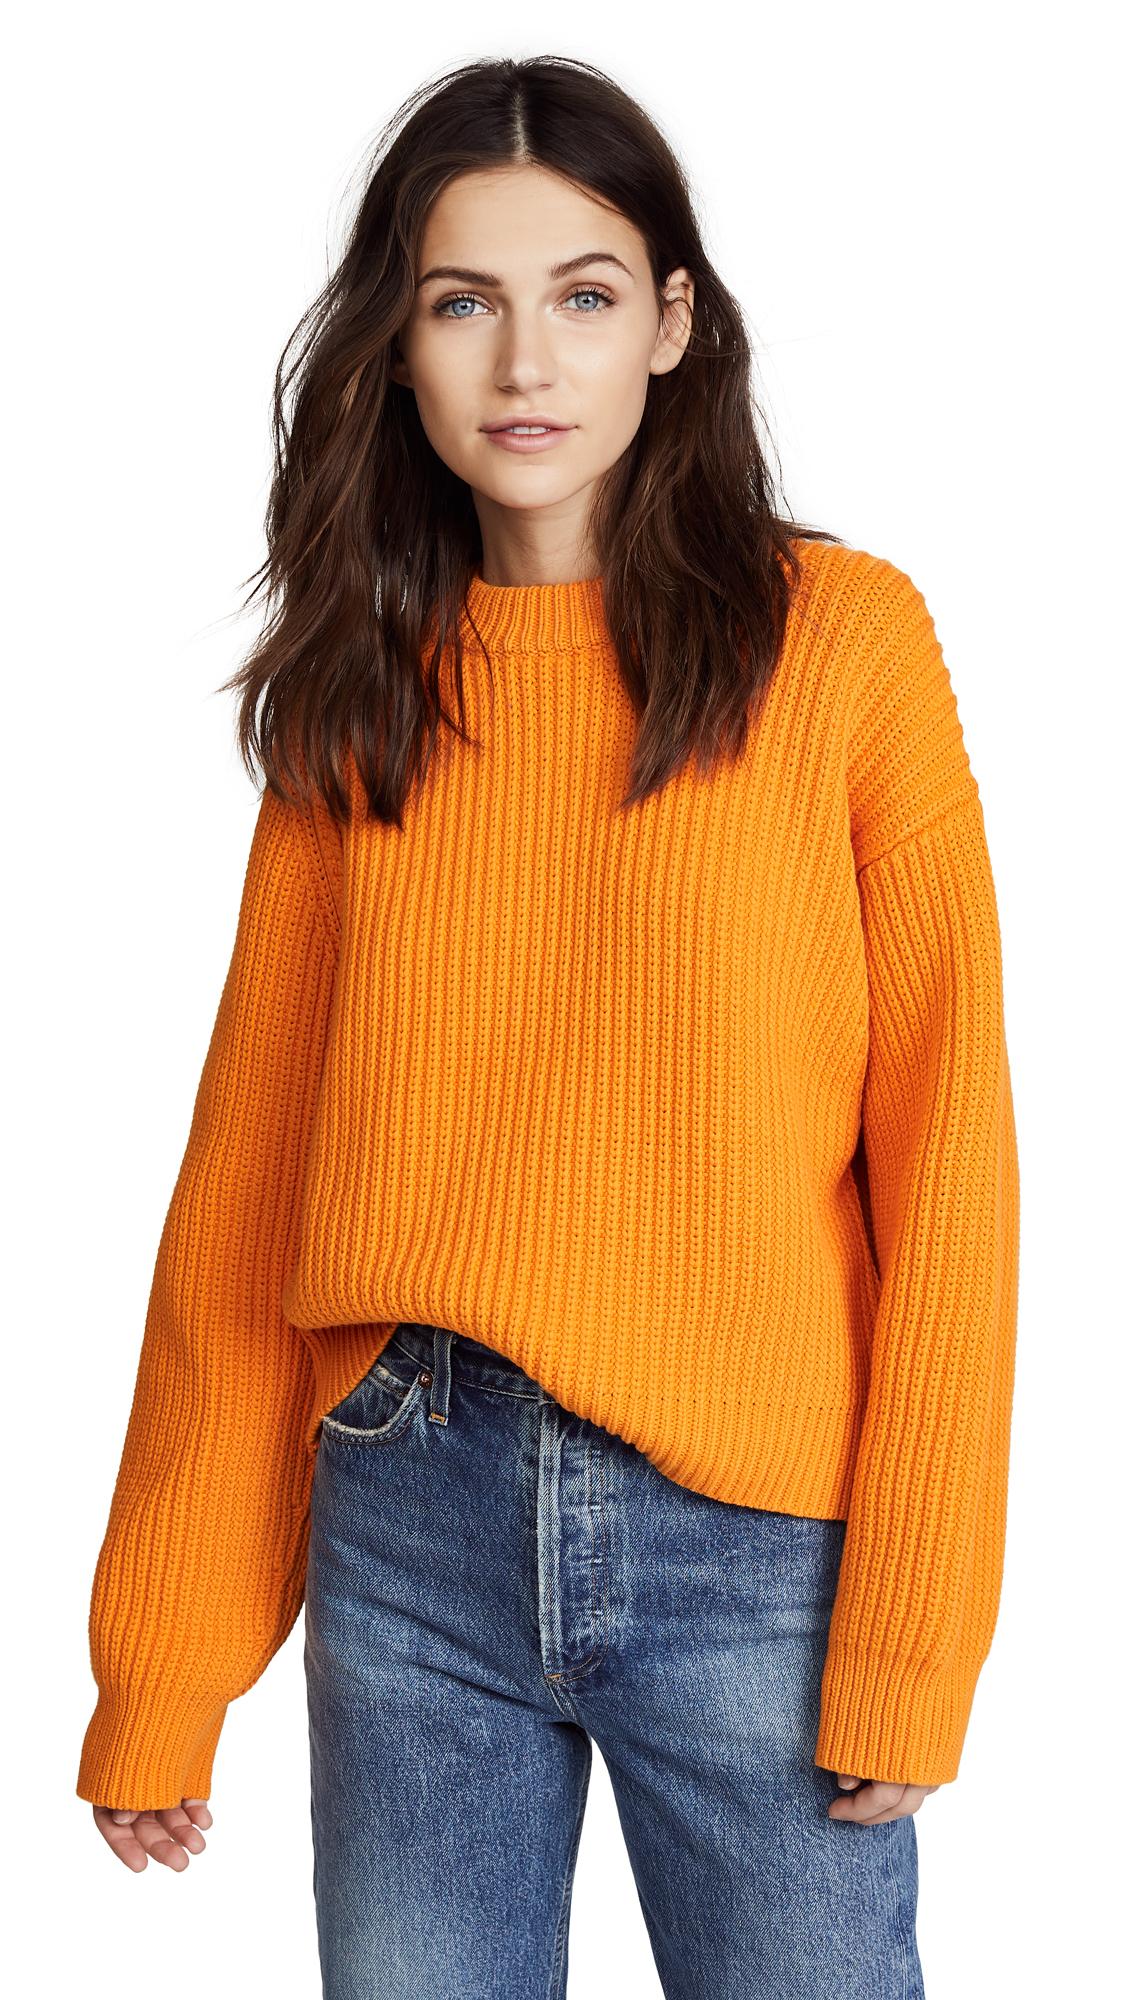 Acne Studios Penina Chunky Sweater - Bright Orange